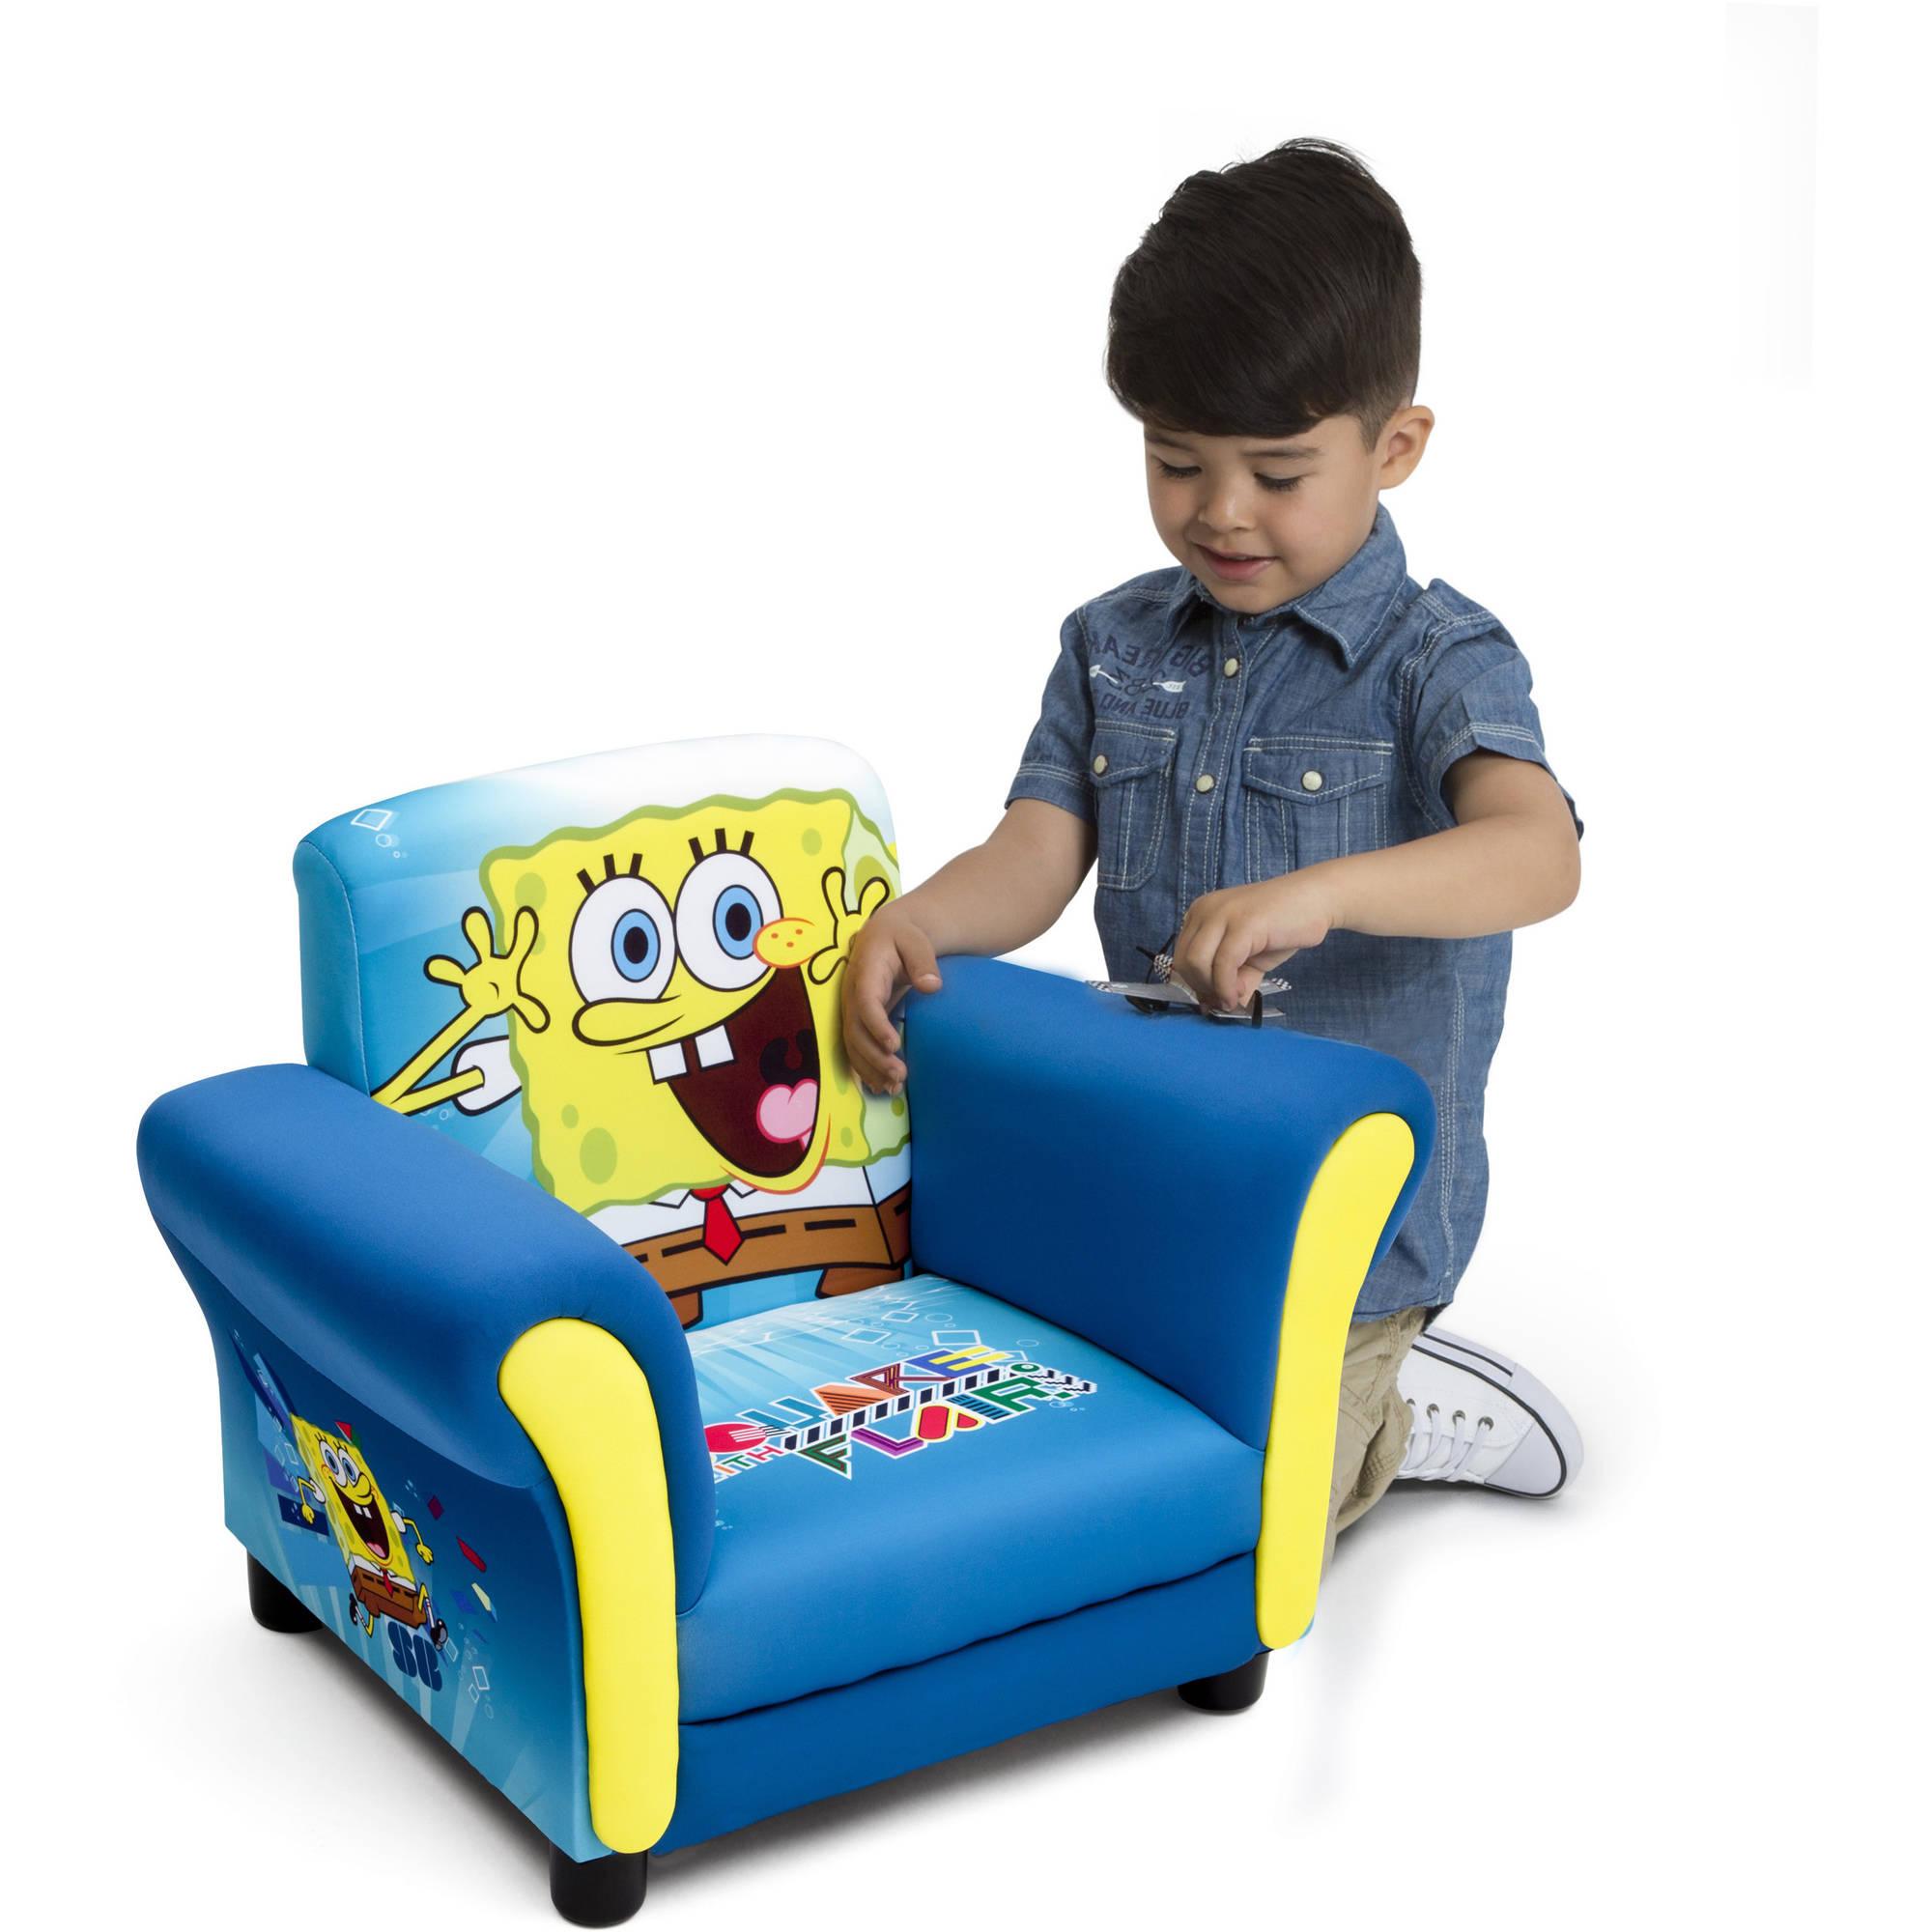 Delta Children's Products Nickelodeon SpongeBob Upholstered Chair